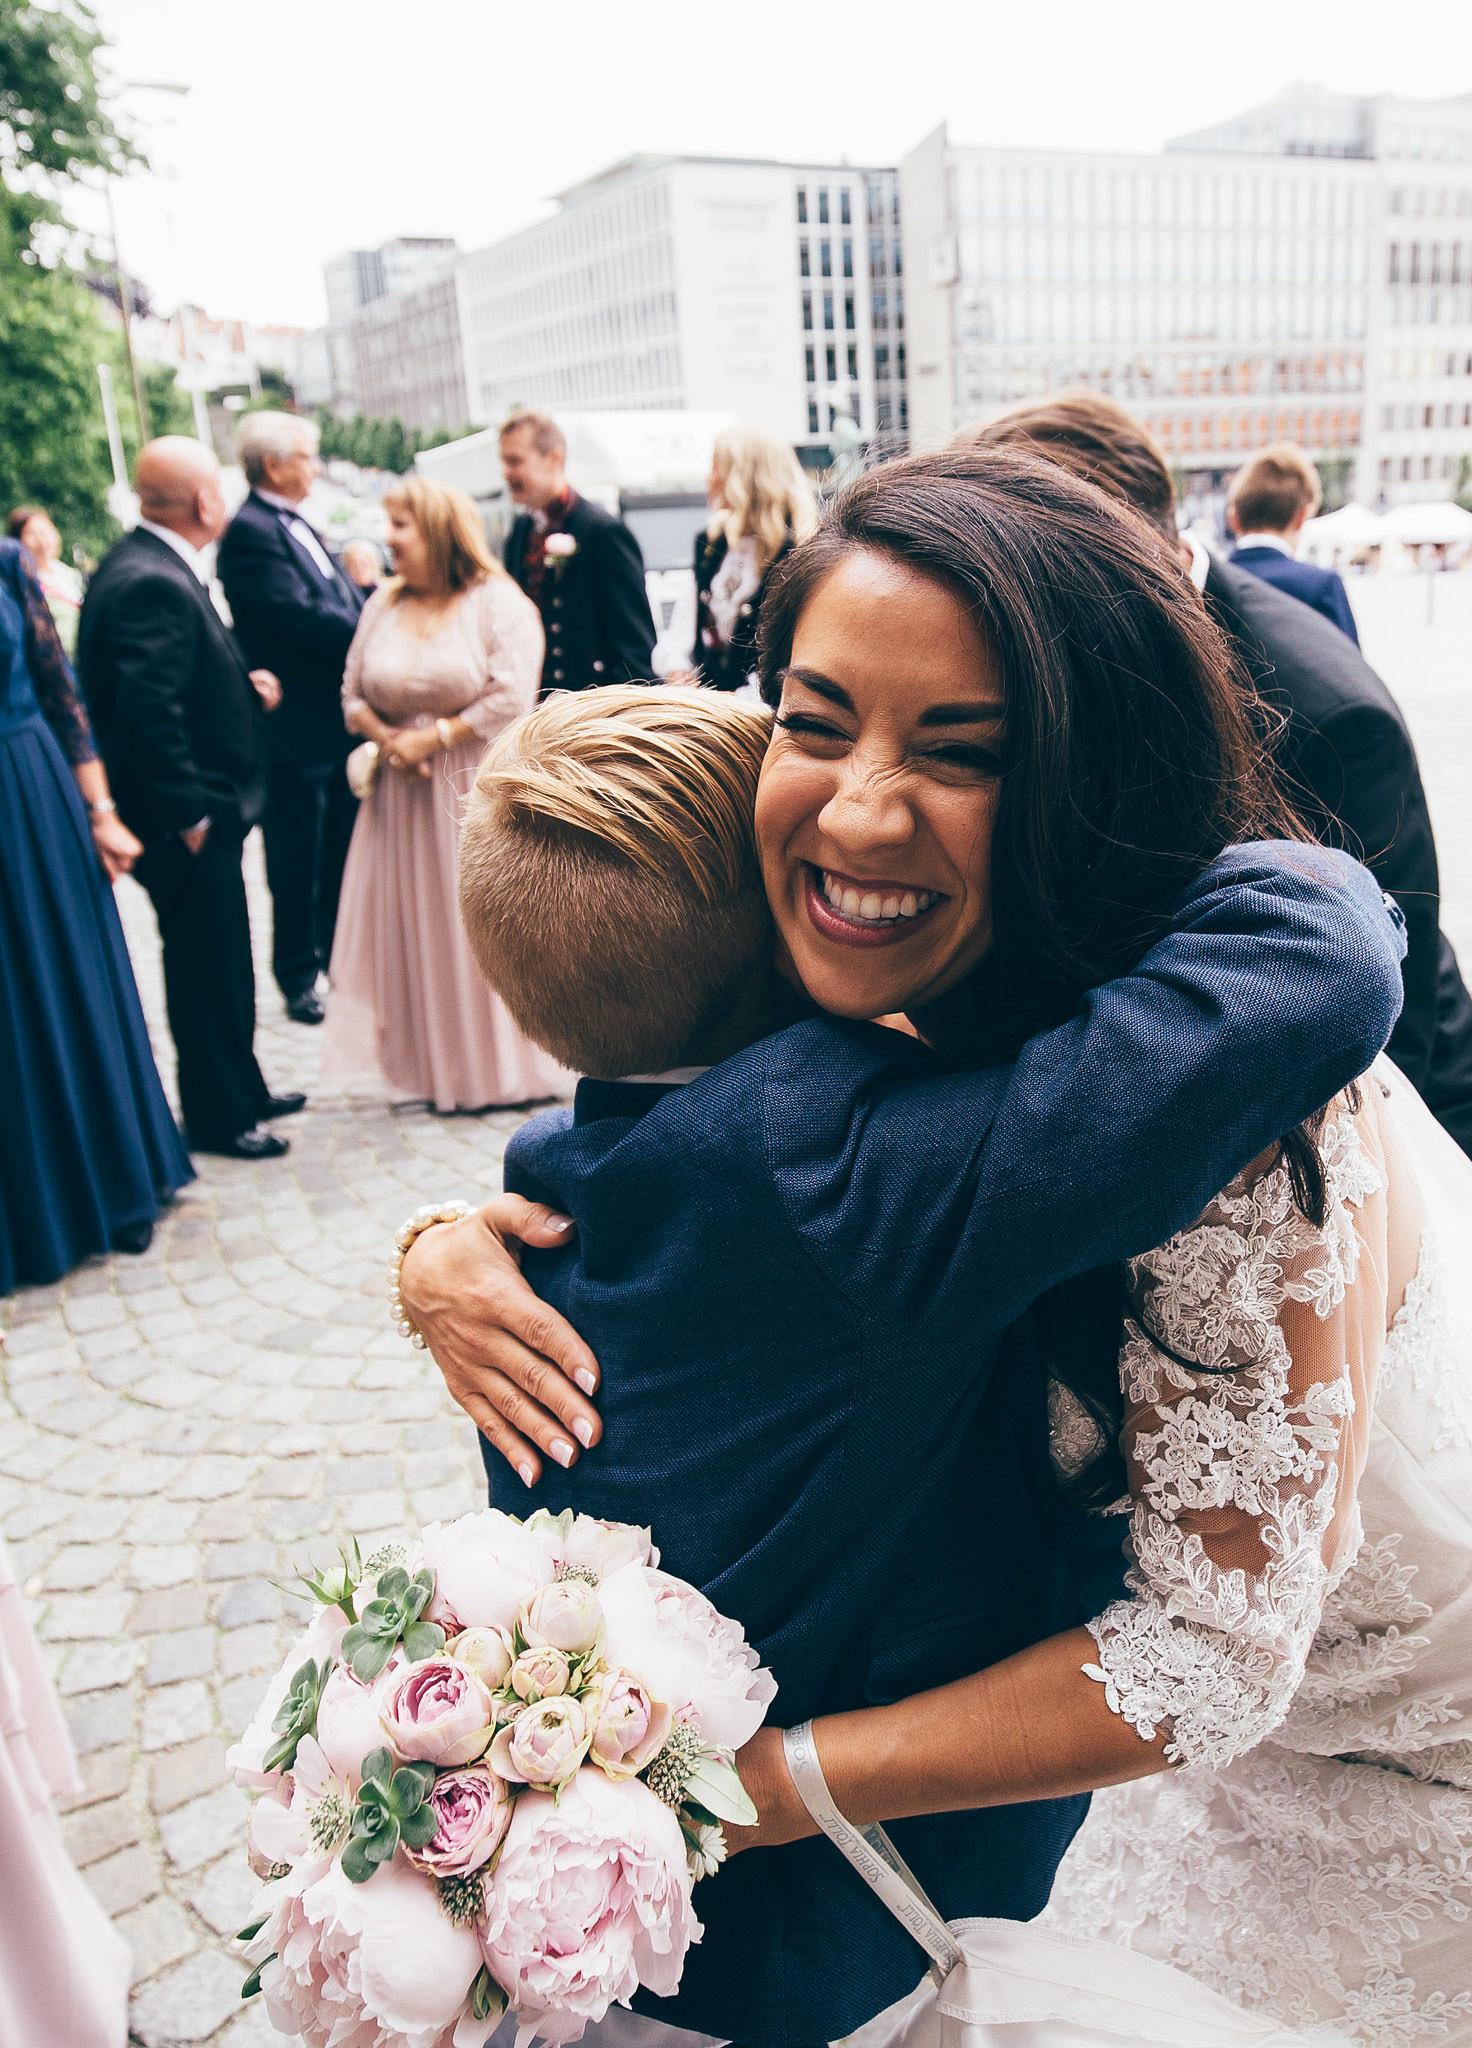 Wedding+Photographer+Norway+Bryllupsfotograf+Casey+Arneson+MK-142.jpg